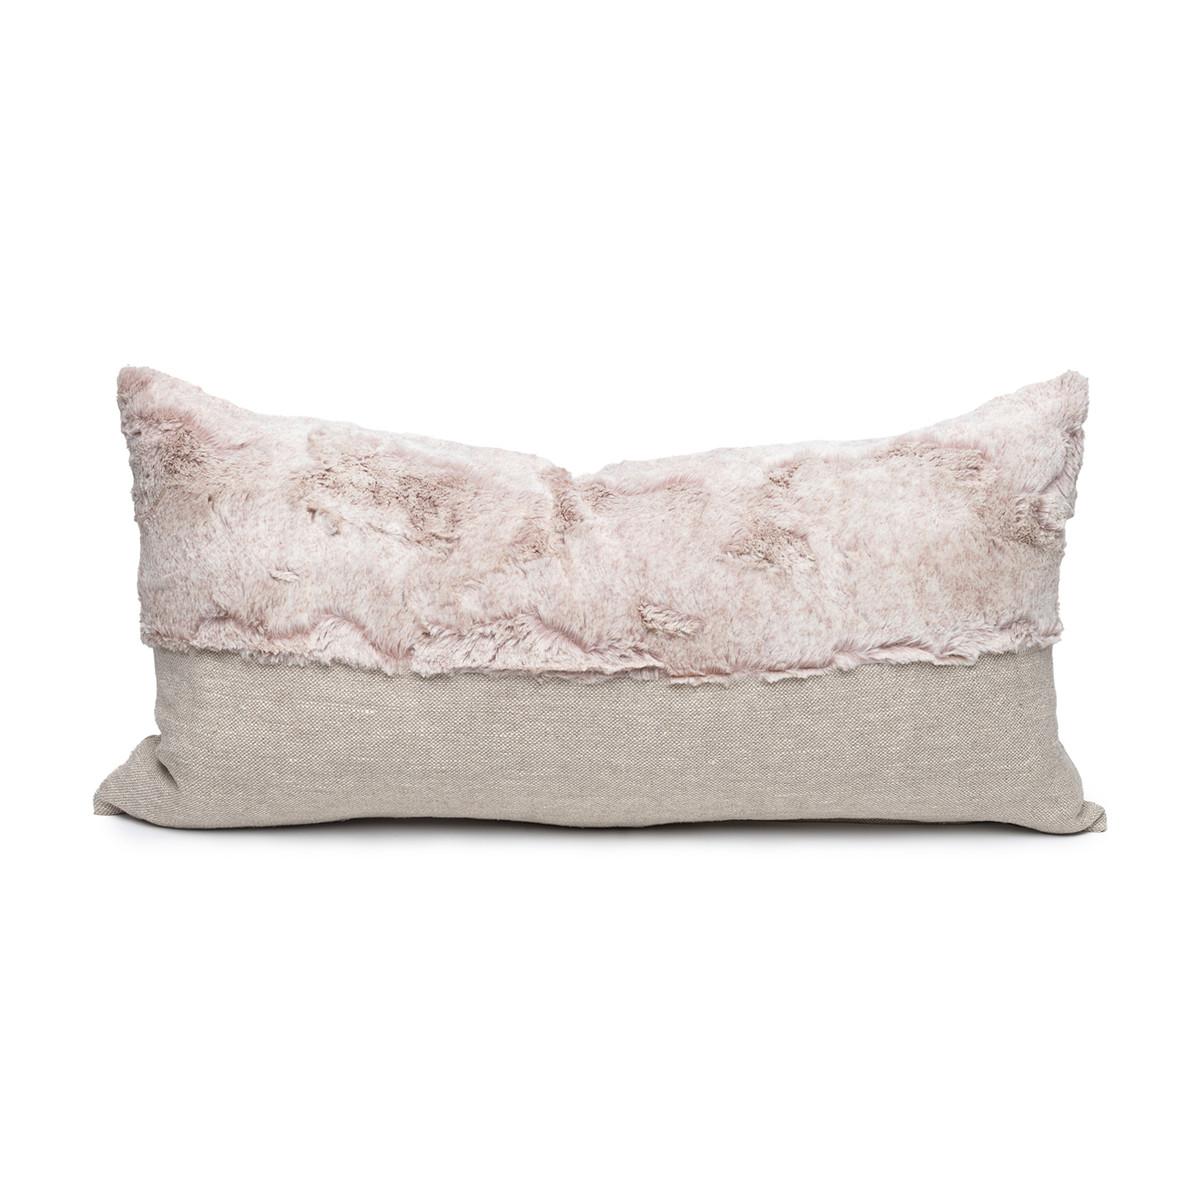 Fable Blush Vegan Faux Fur Lumbar Pillow  - Front